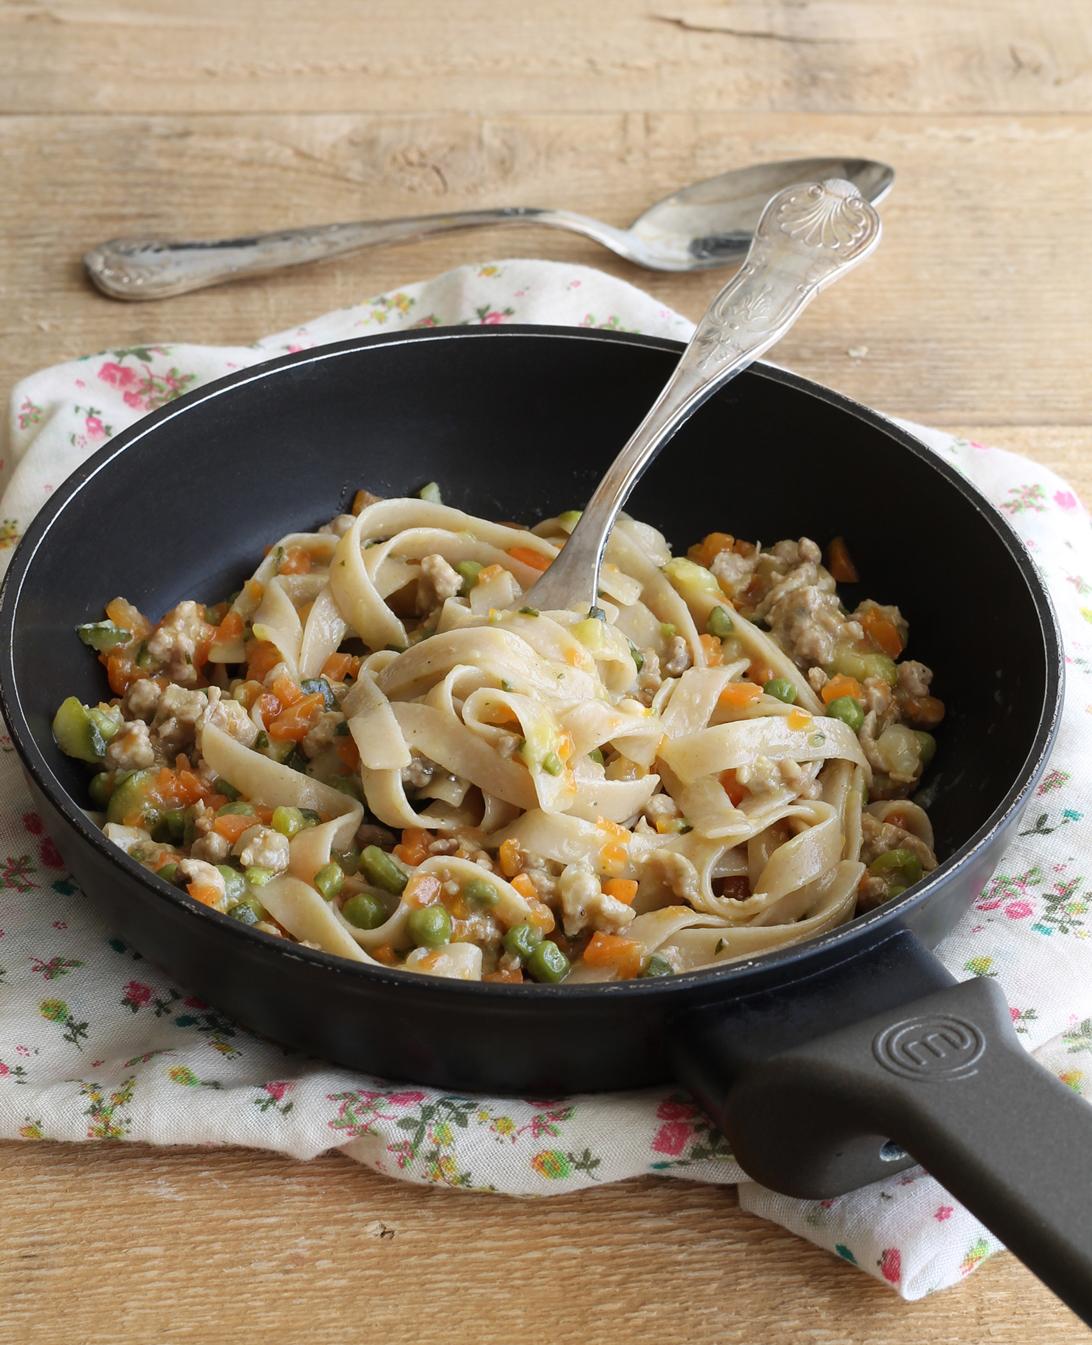 Tagliatelle con ragù di salsiccia e verdure - La Cassata Celiaca